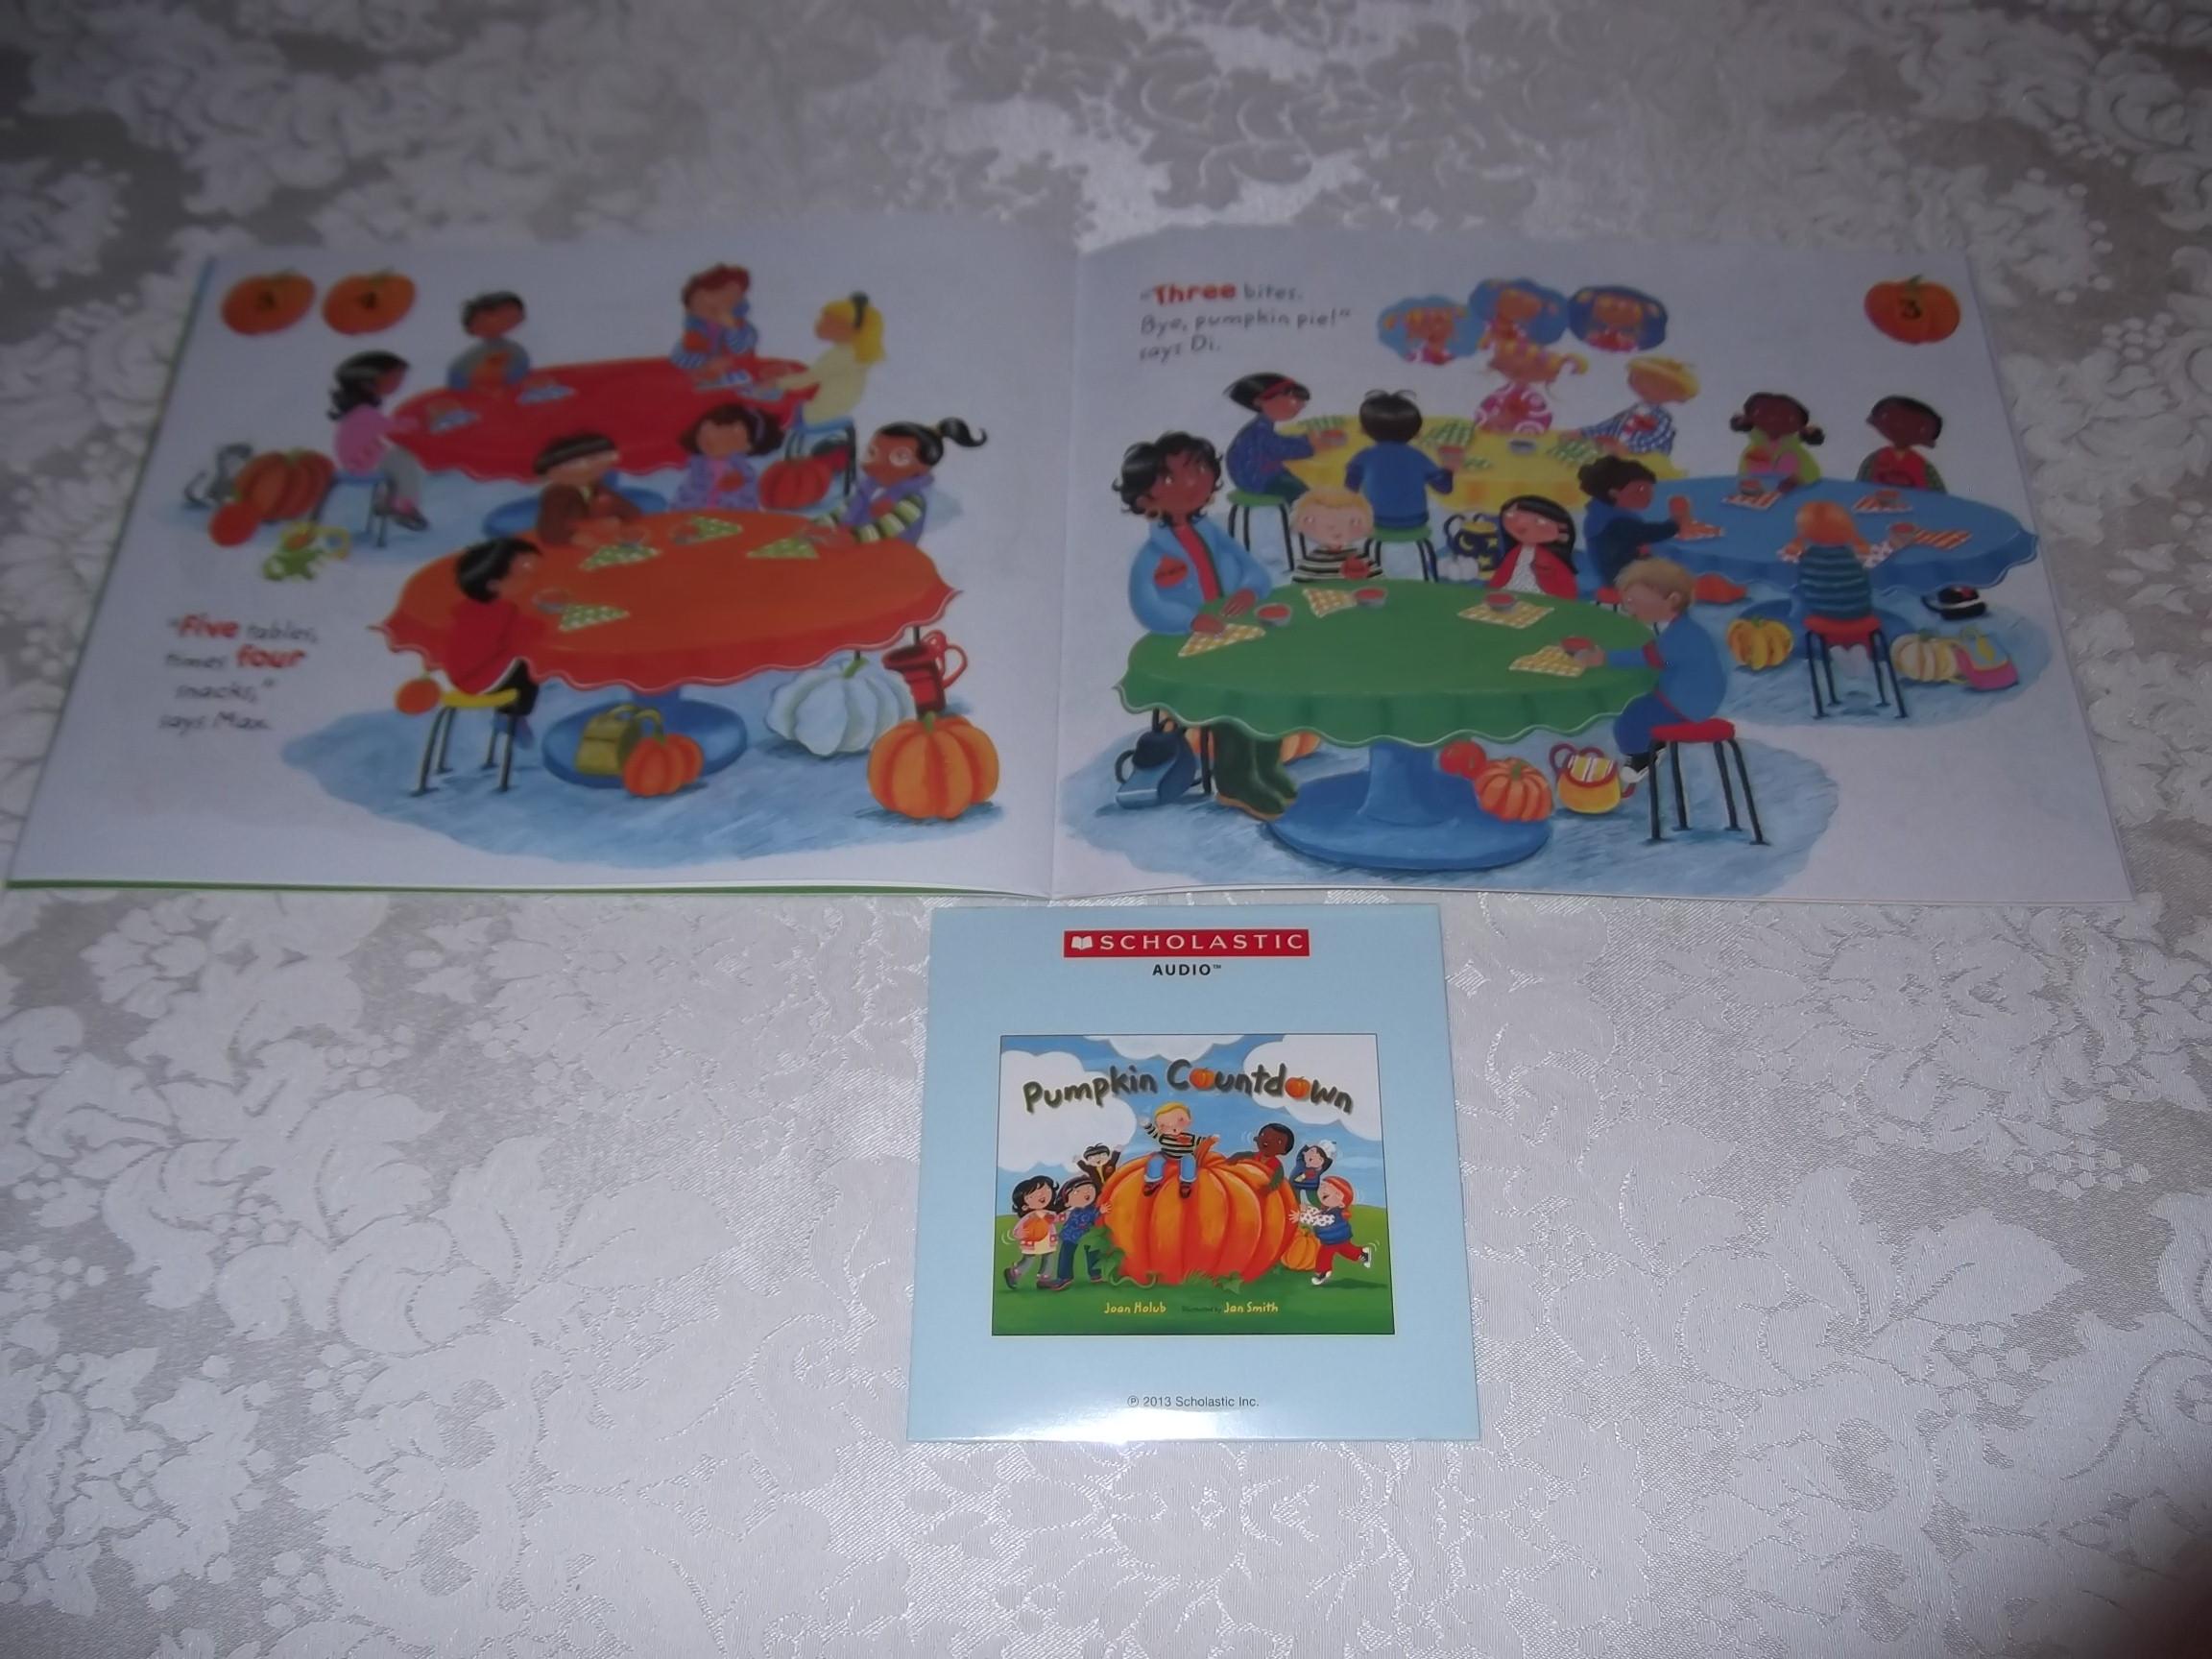 Image 7 of Pumpkin Countdown Joan Holub Audio CD & SC Set Brand New